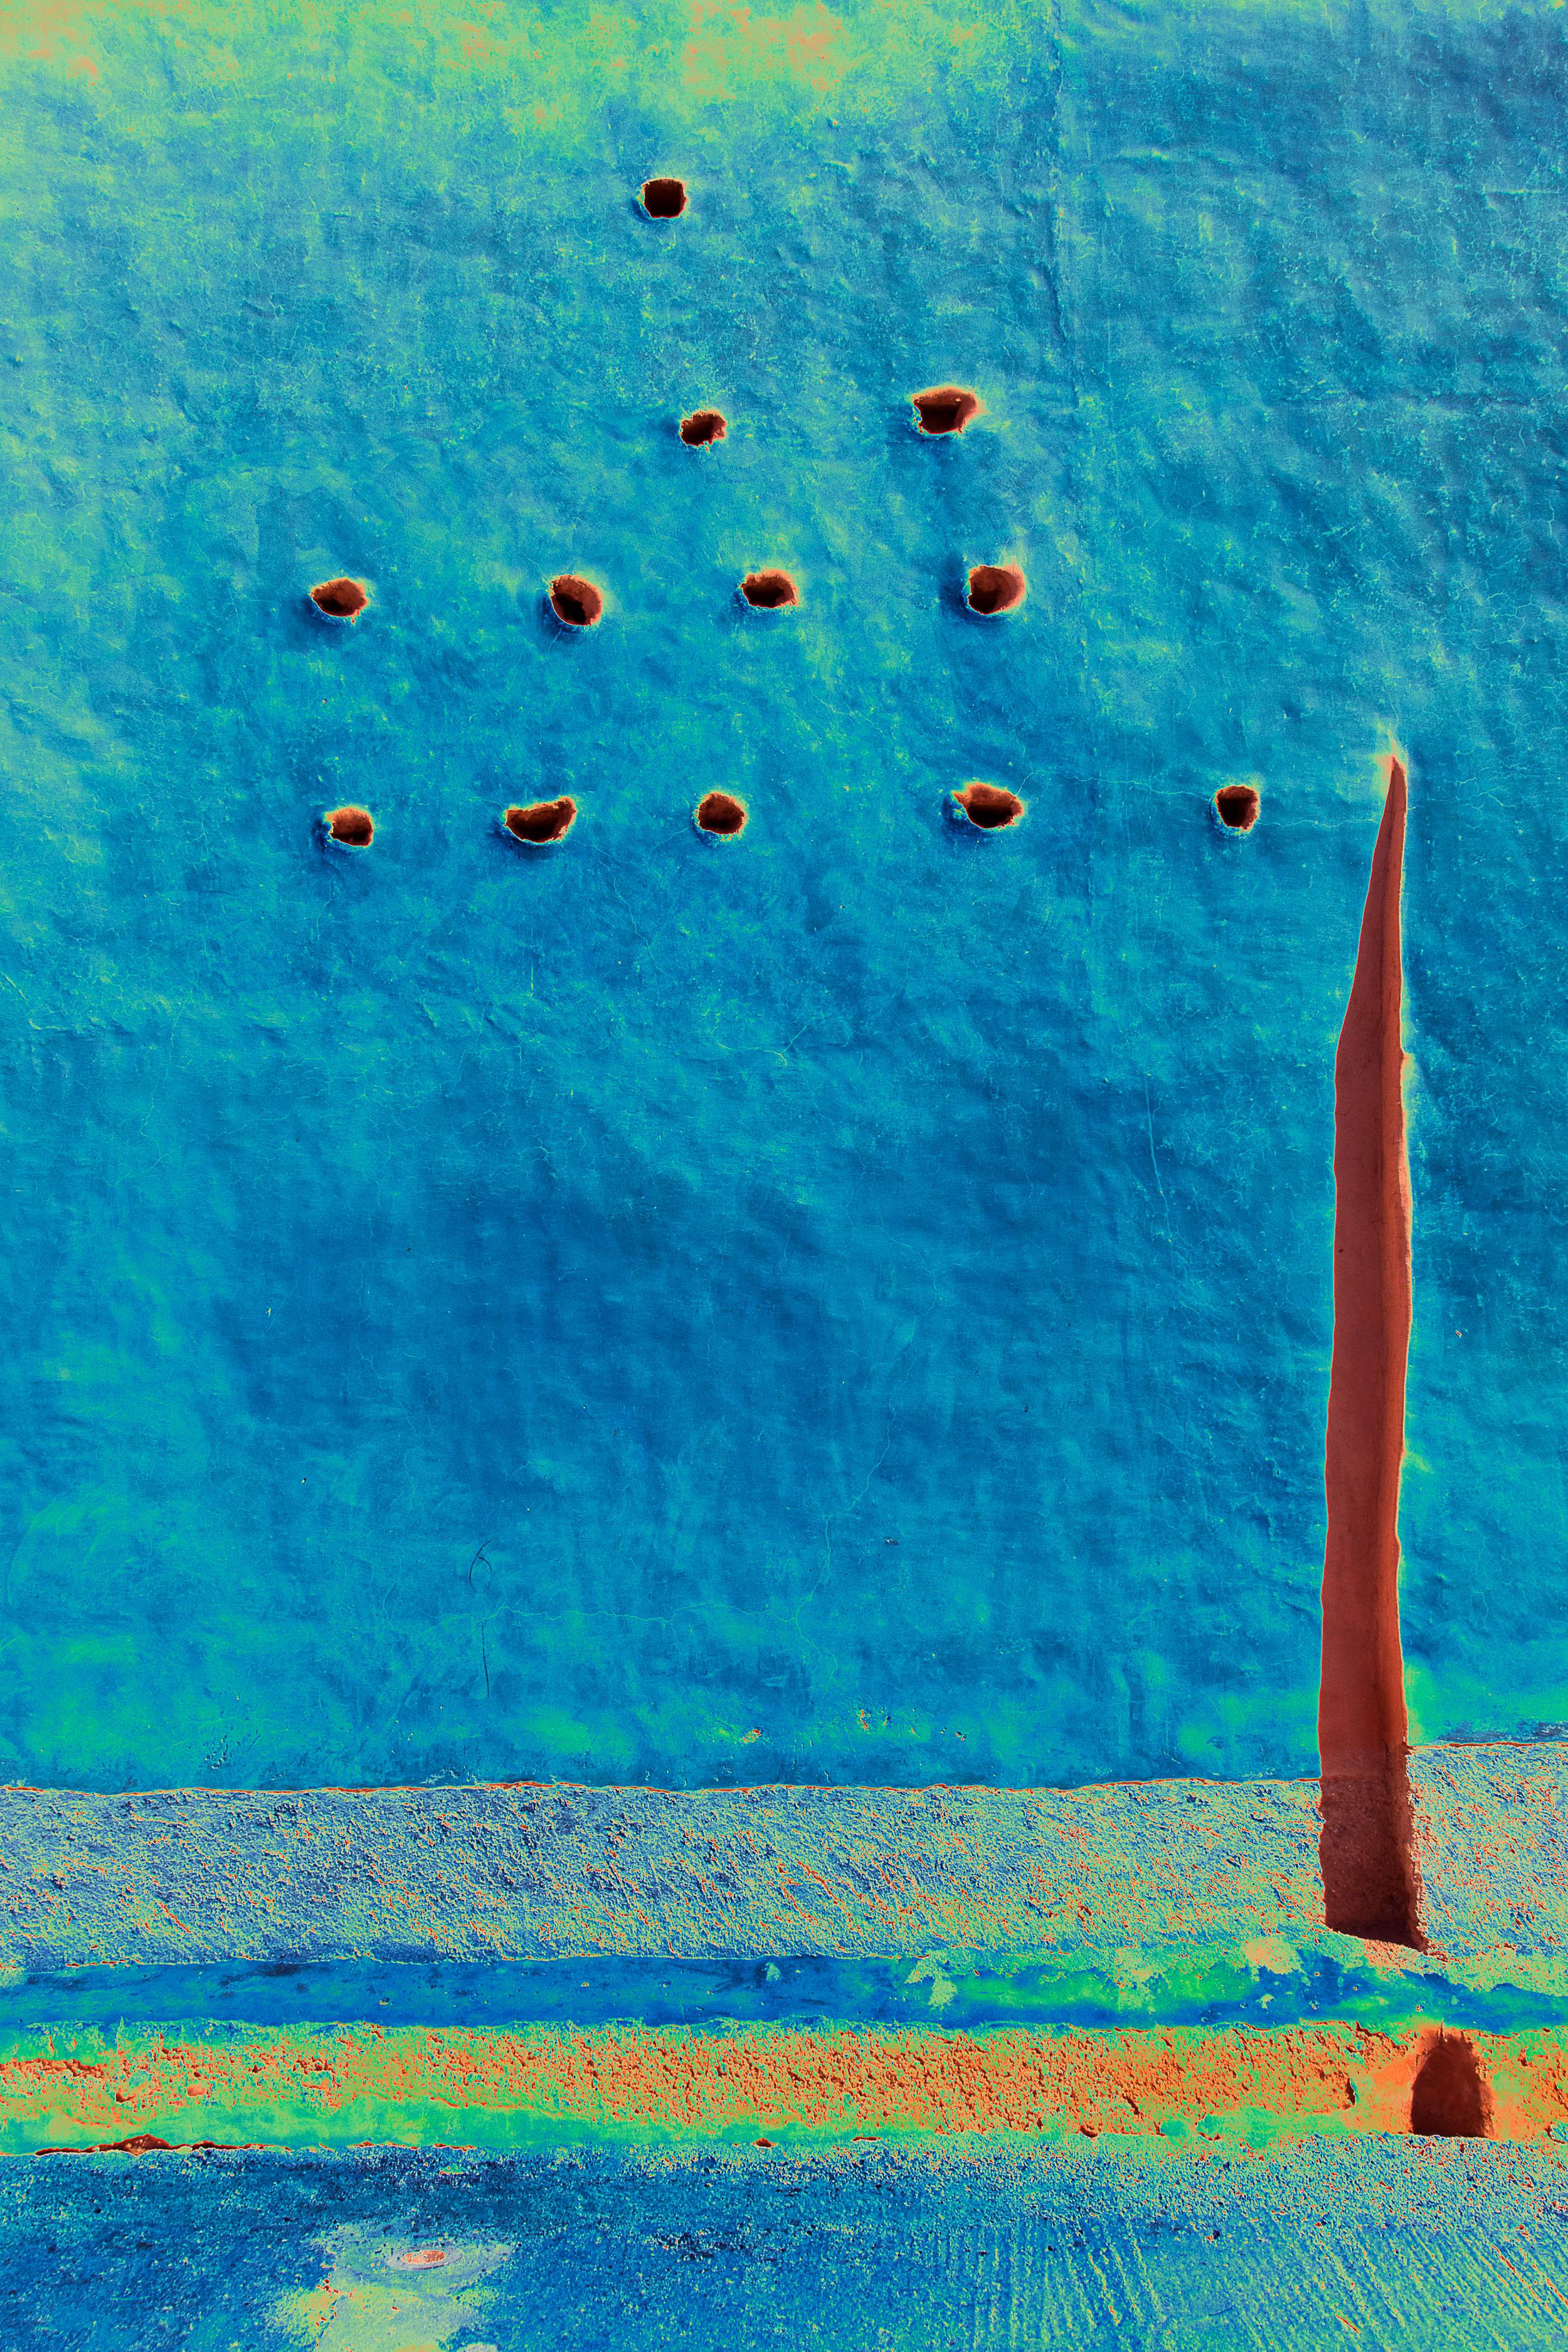 151215 Blue Flame Wall 12x18-0849.jpg